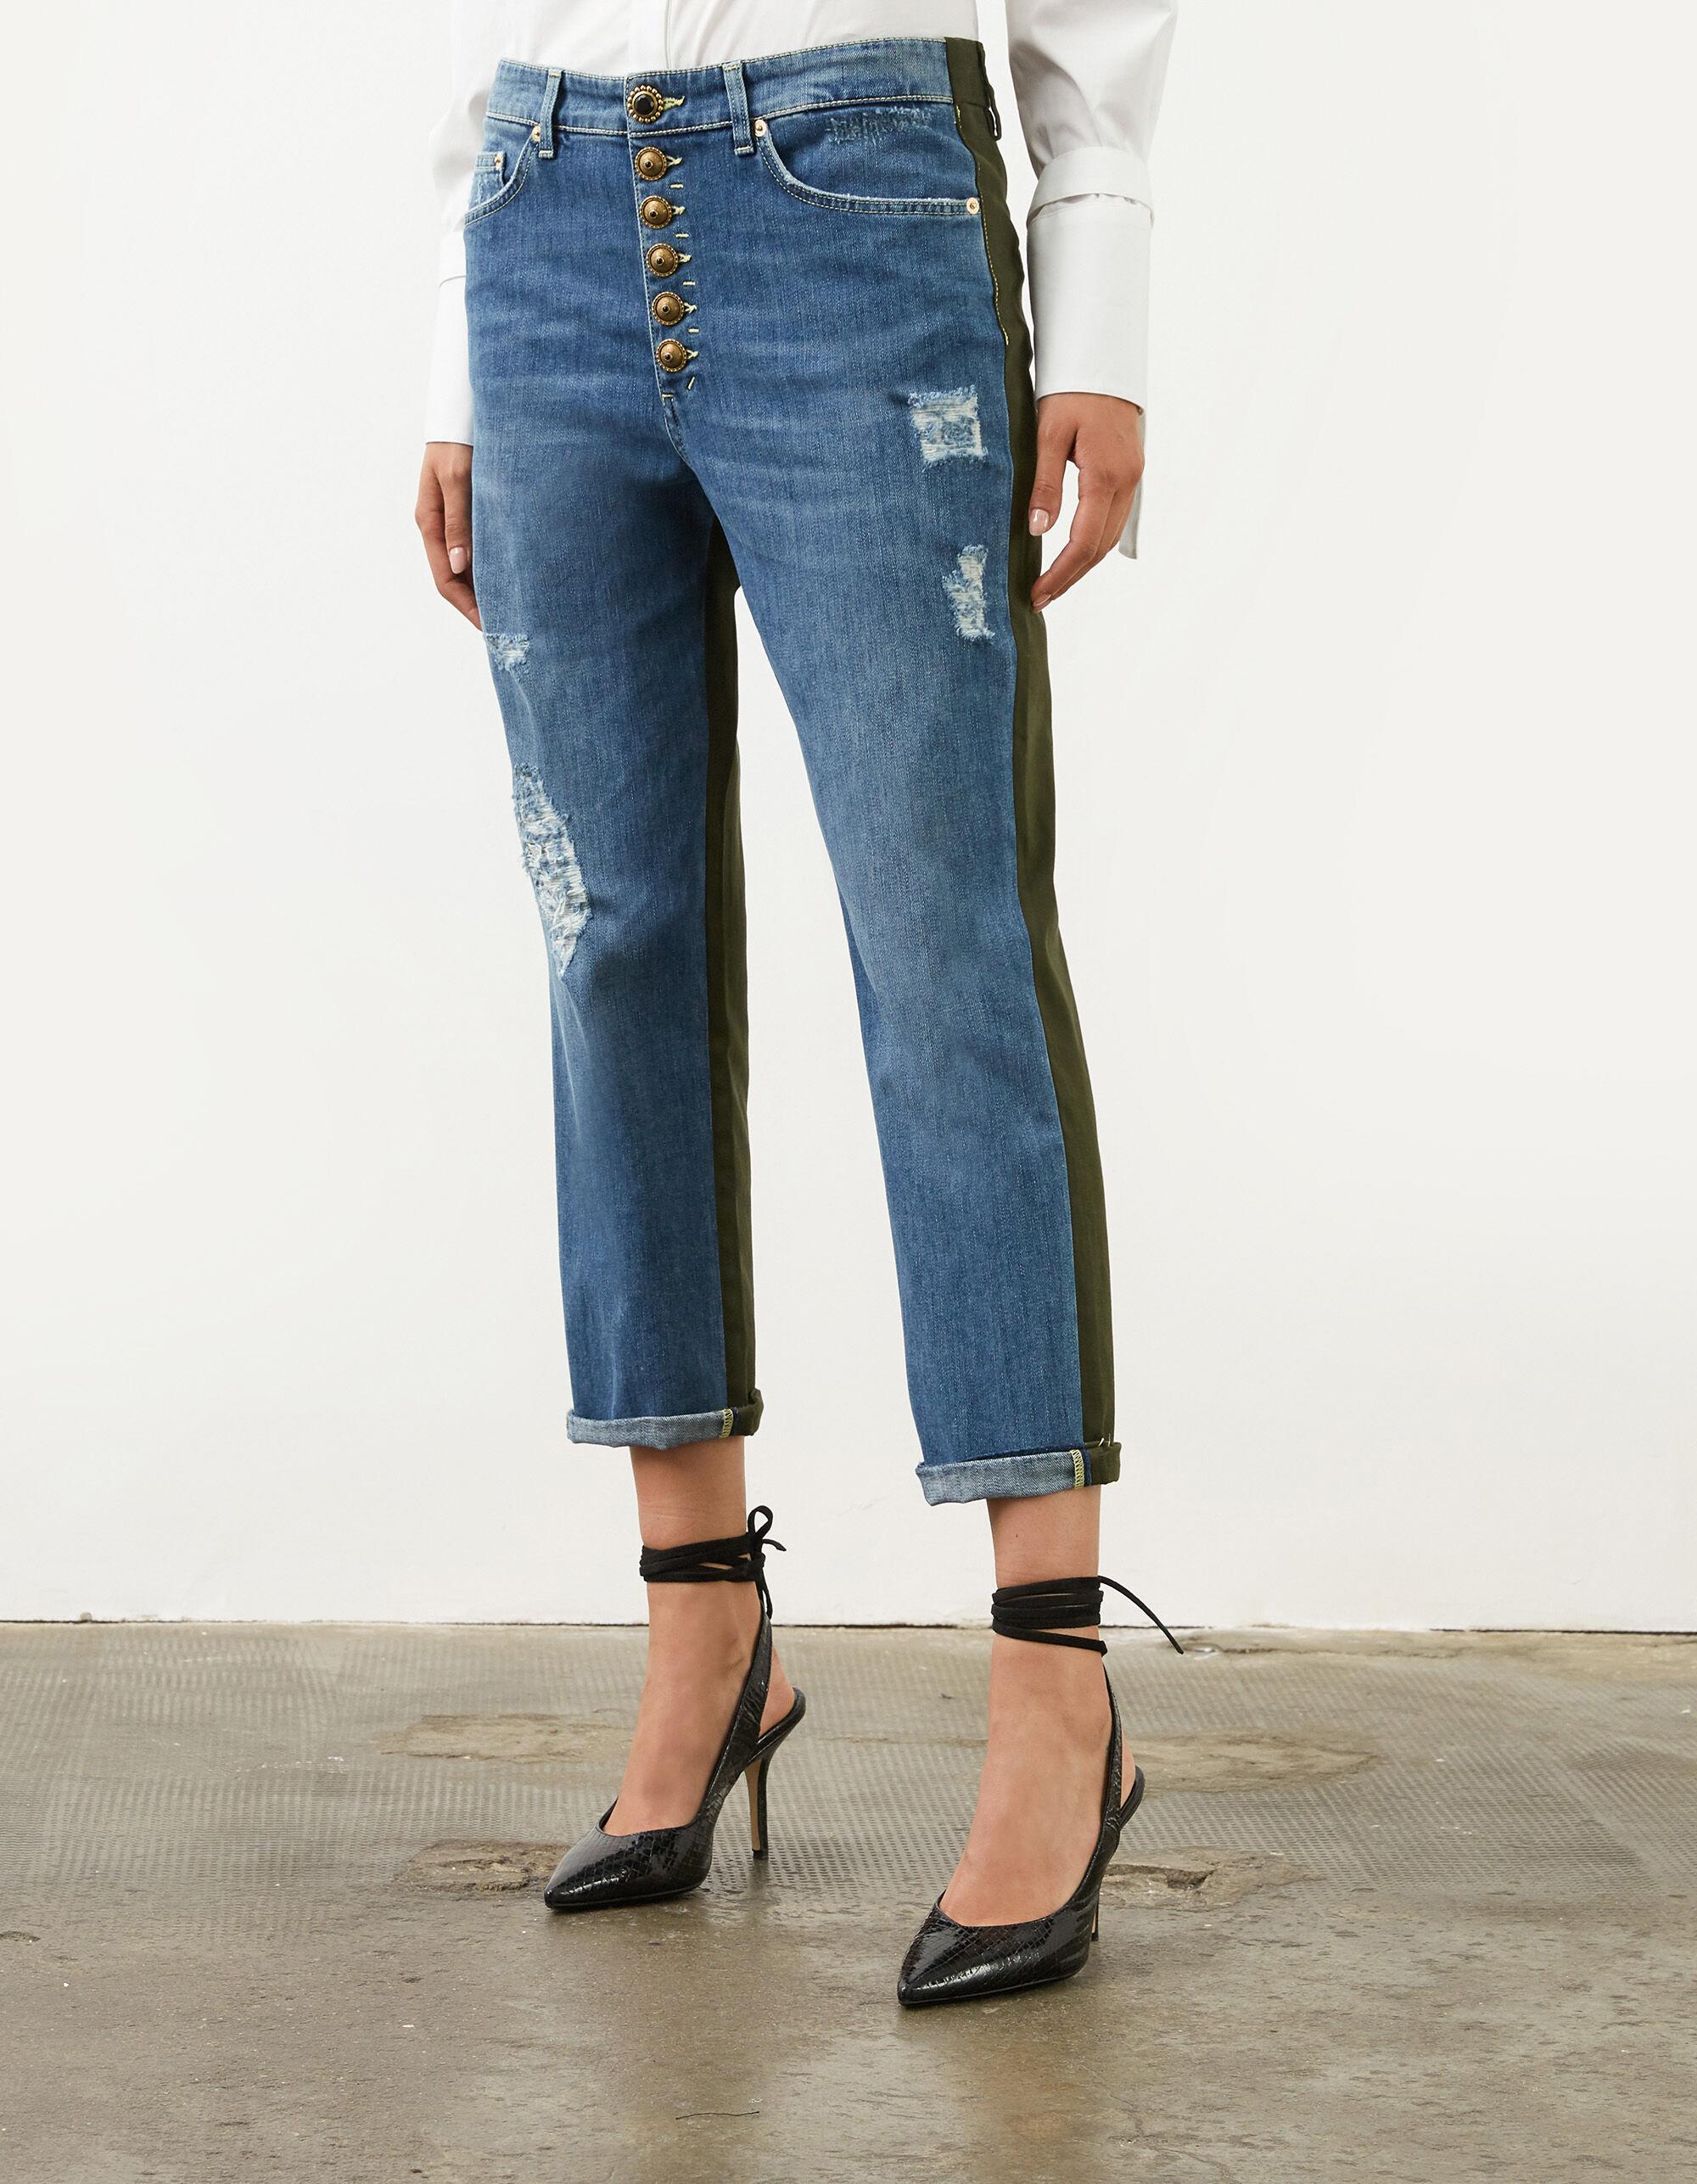 Loose Koons jeans in denim and gabardine - Dondup